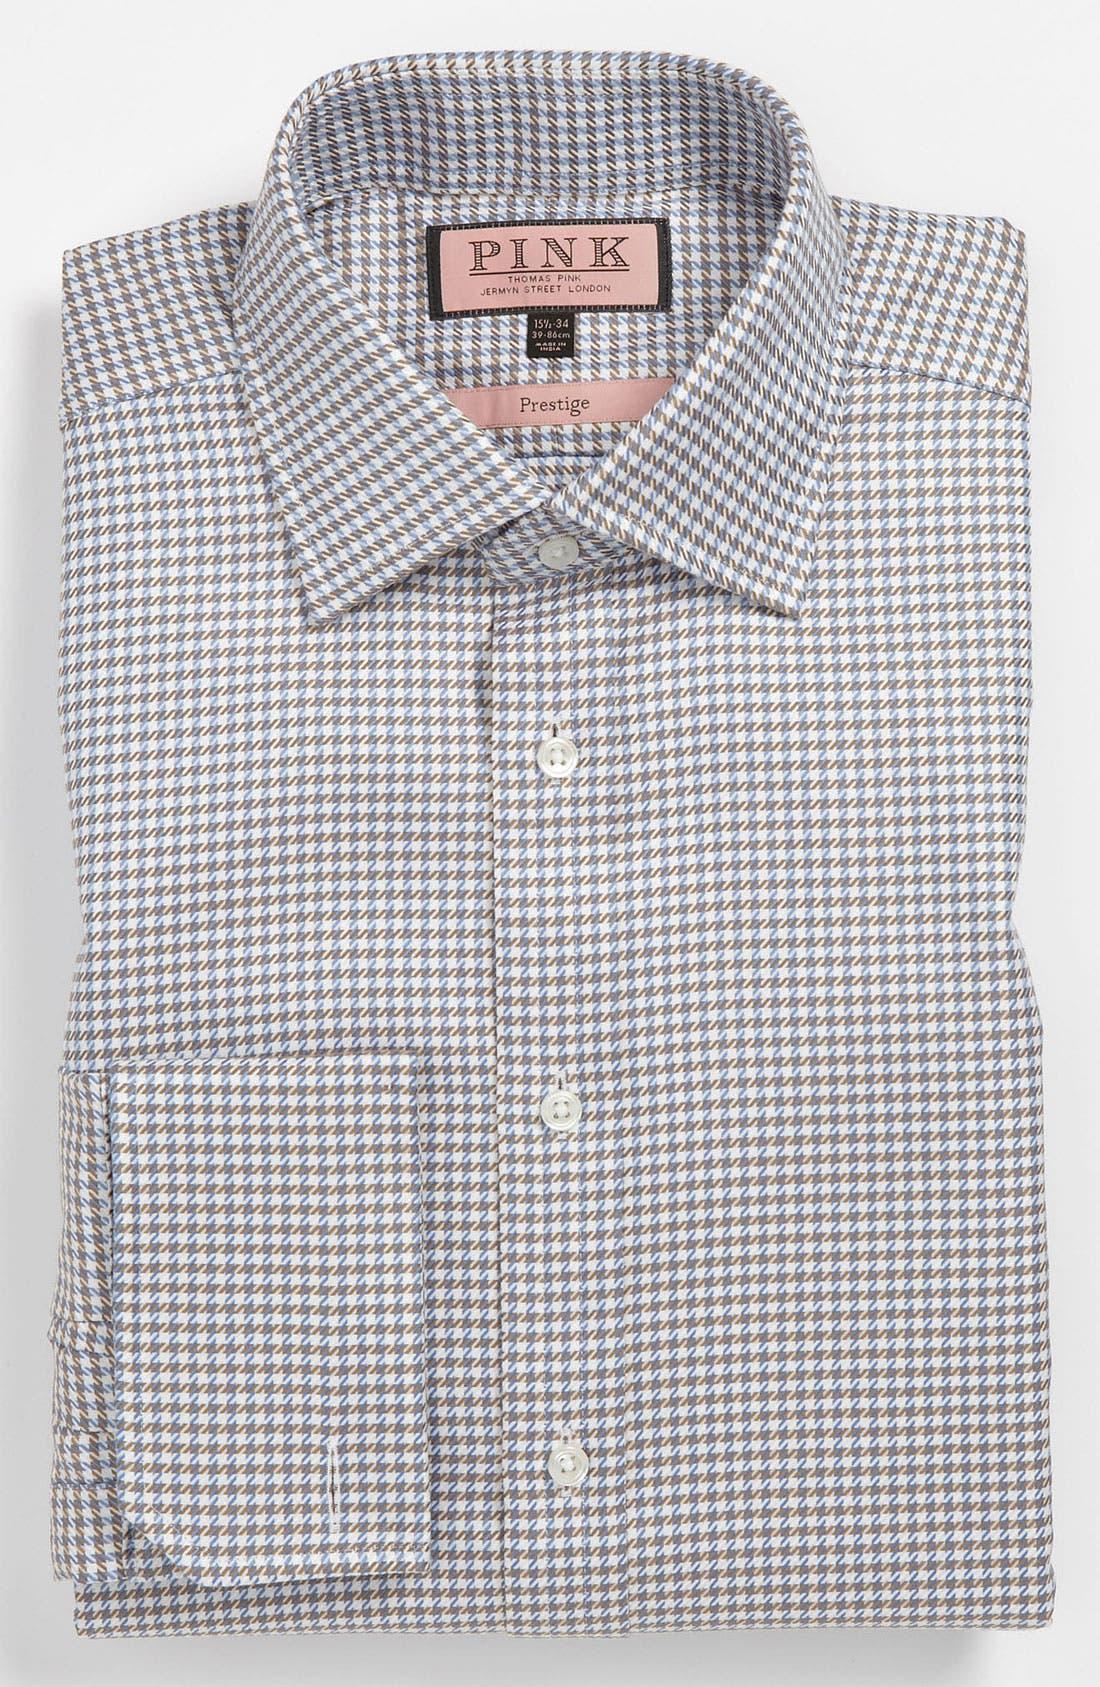 Alternate Image 1 Selected - Thomas Pink Classic Fit Prestige Dress Shirt